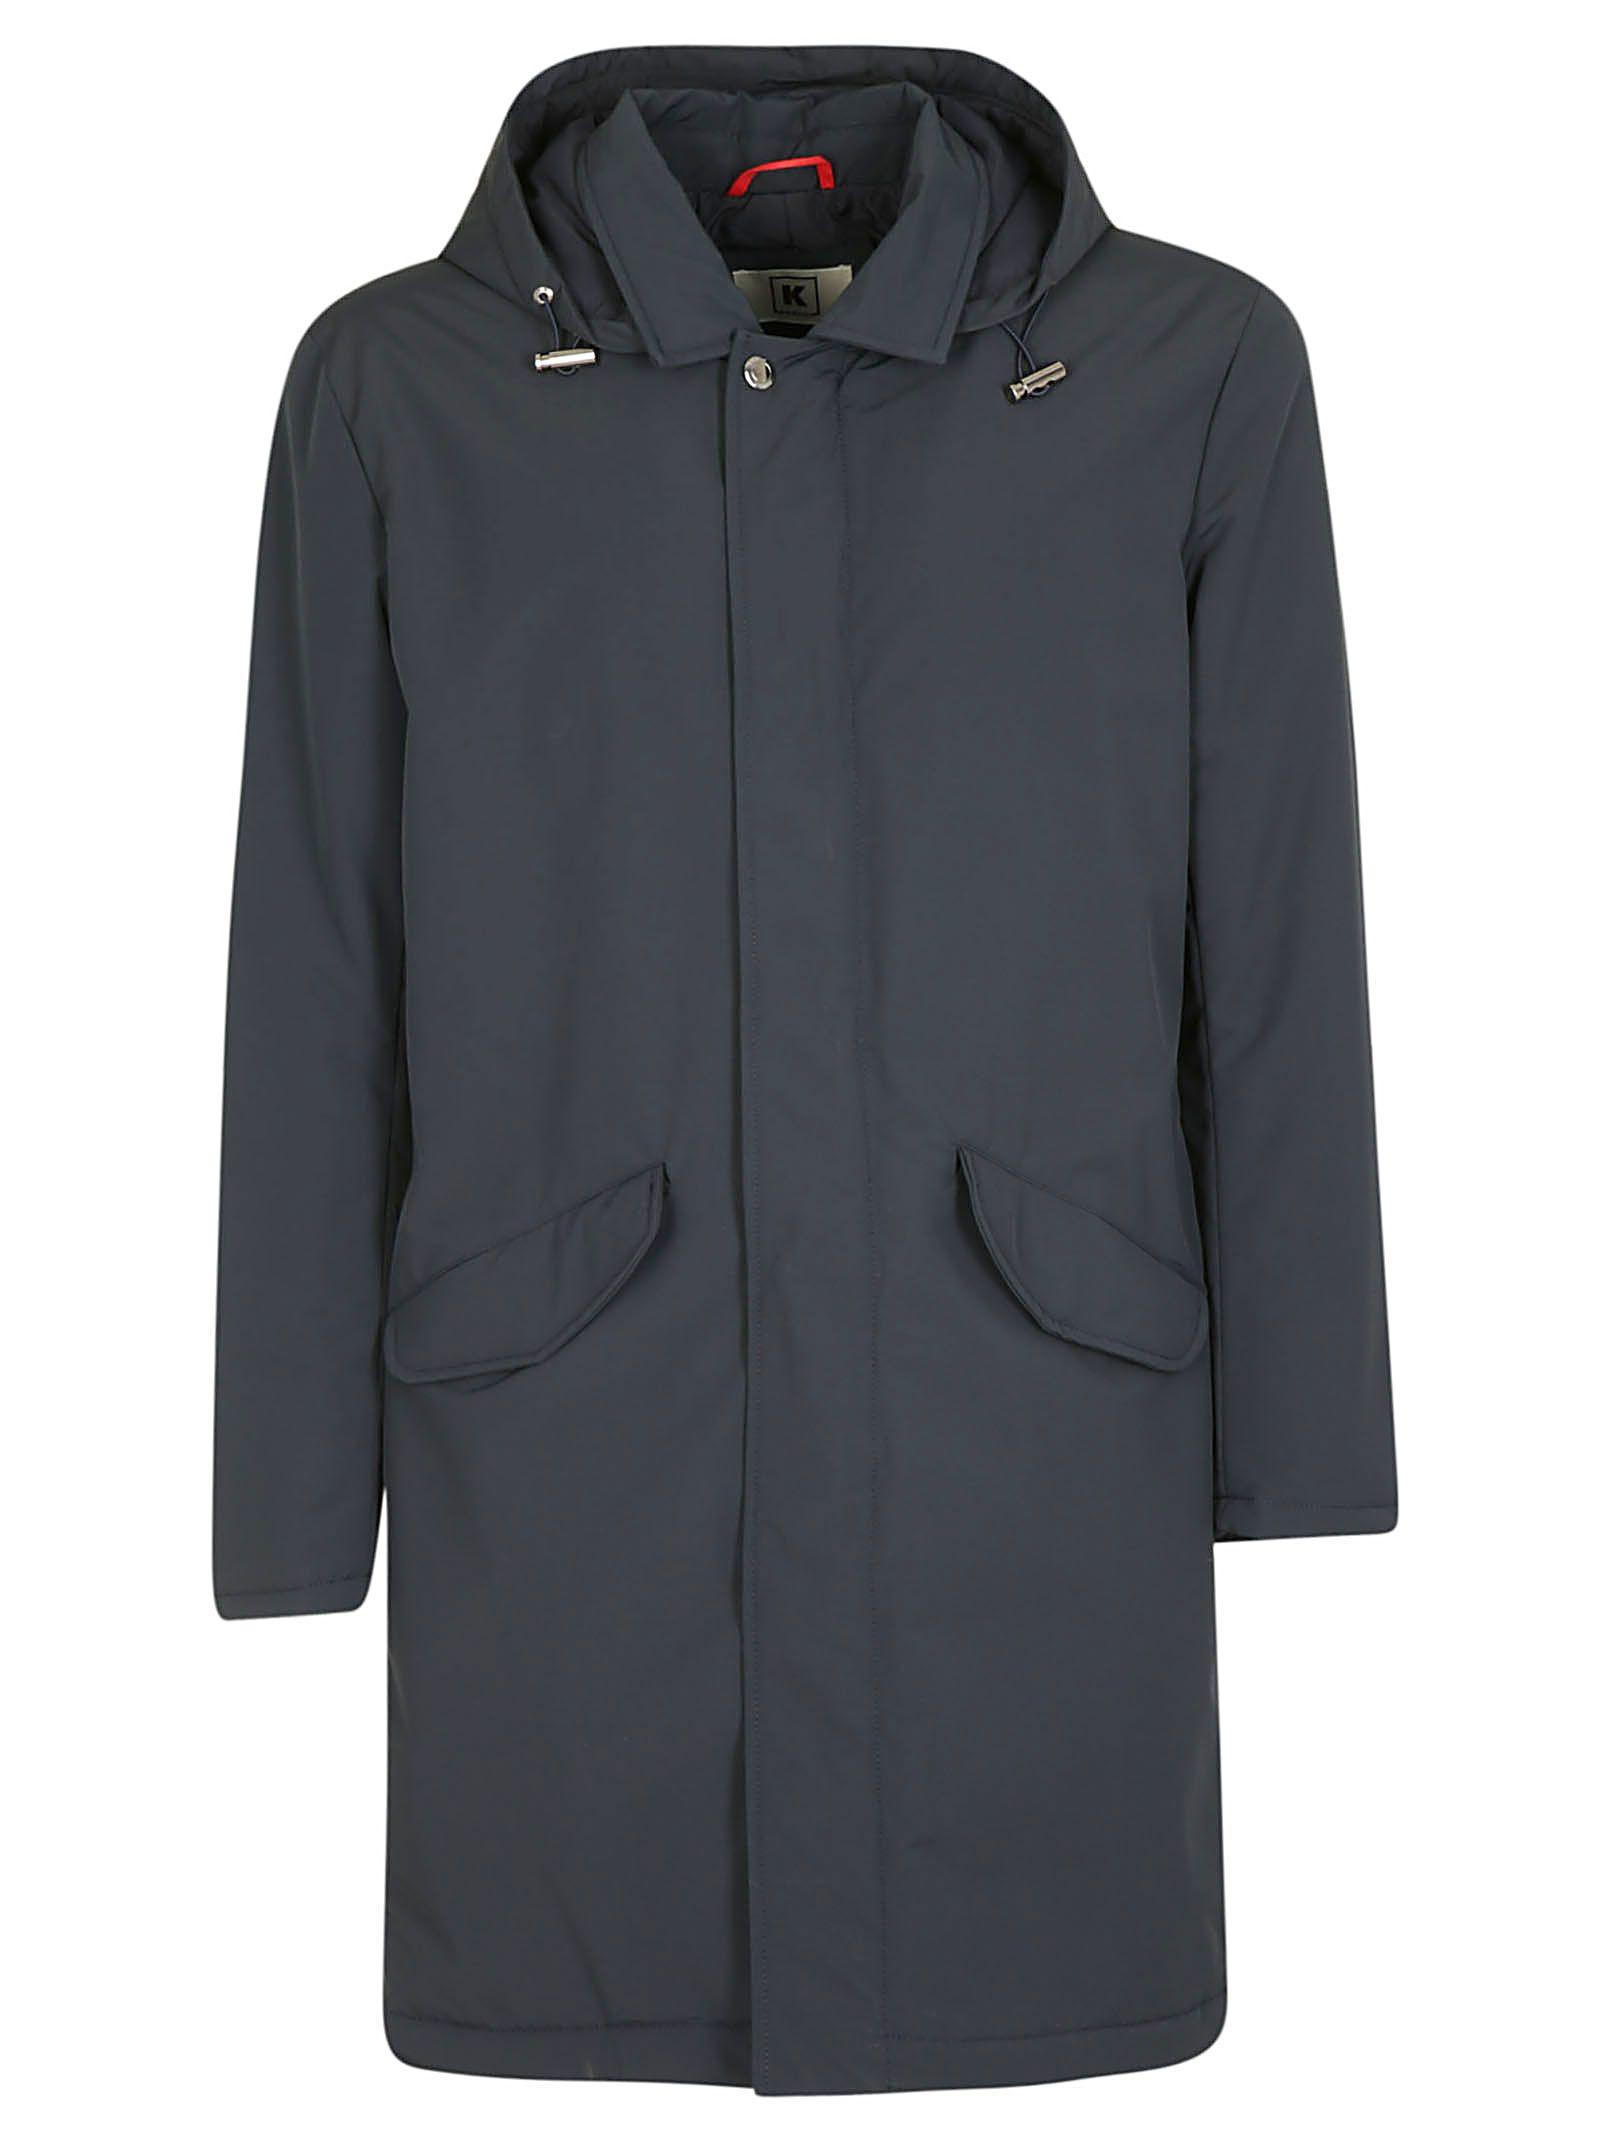 Kired Internal Layer Hood Jacket